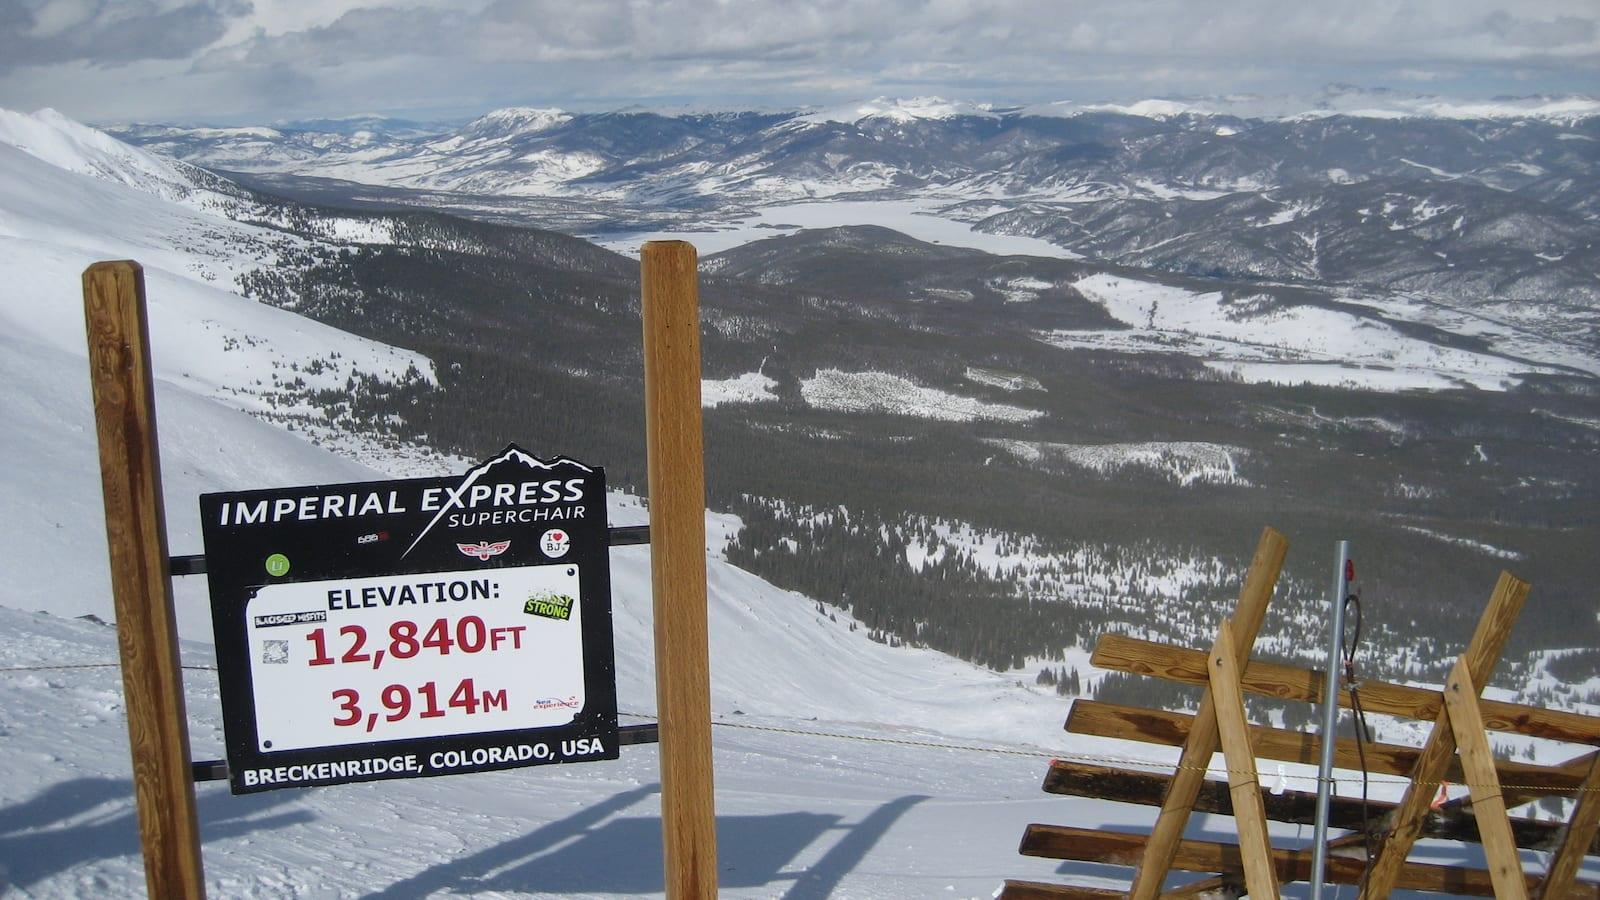 Breckenridge Ski Resort Atop the Imperial Express Superchair